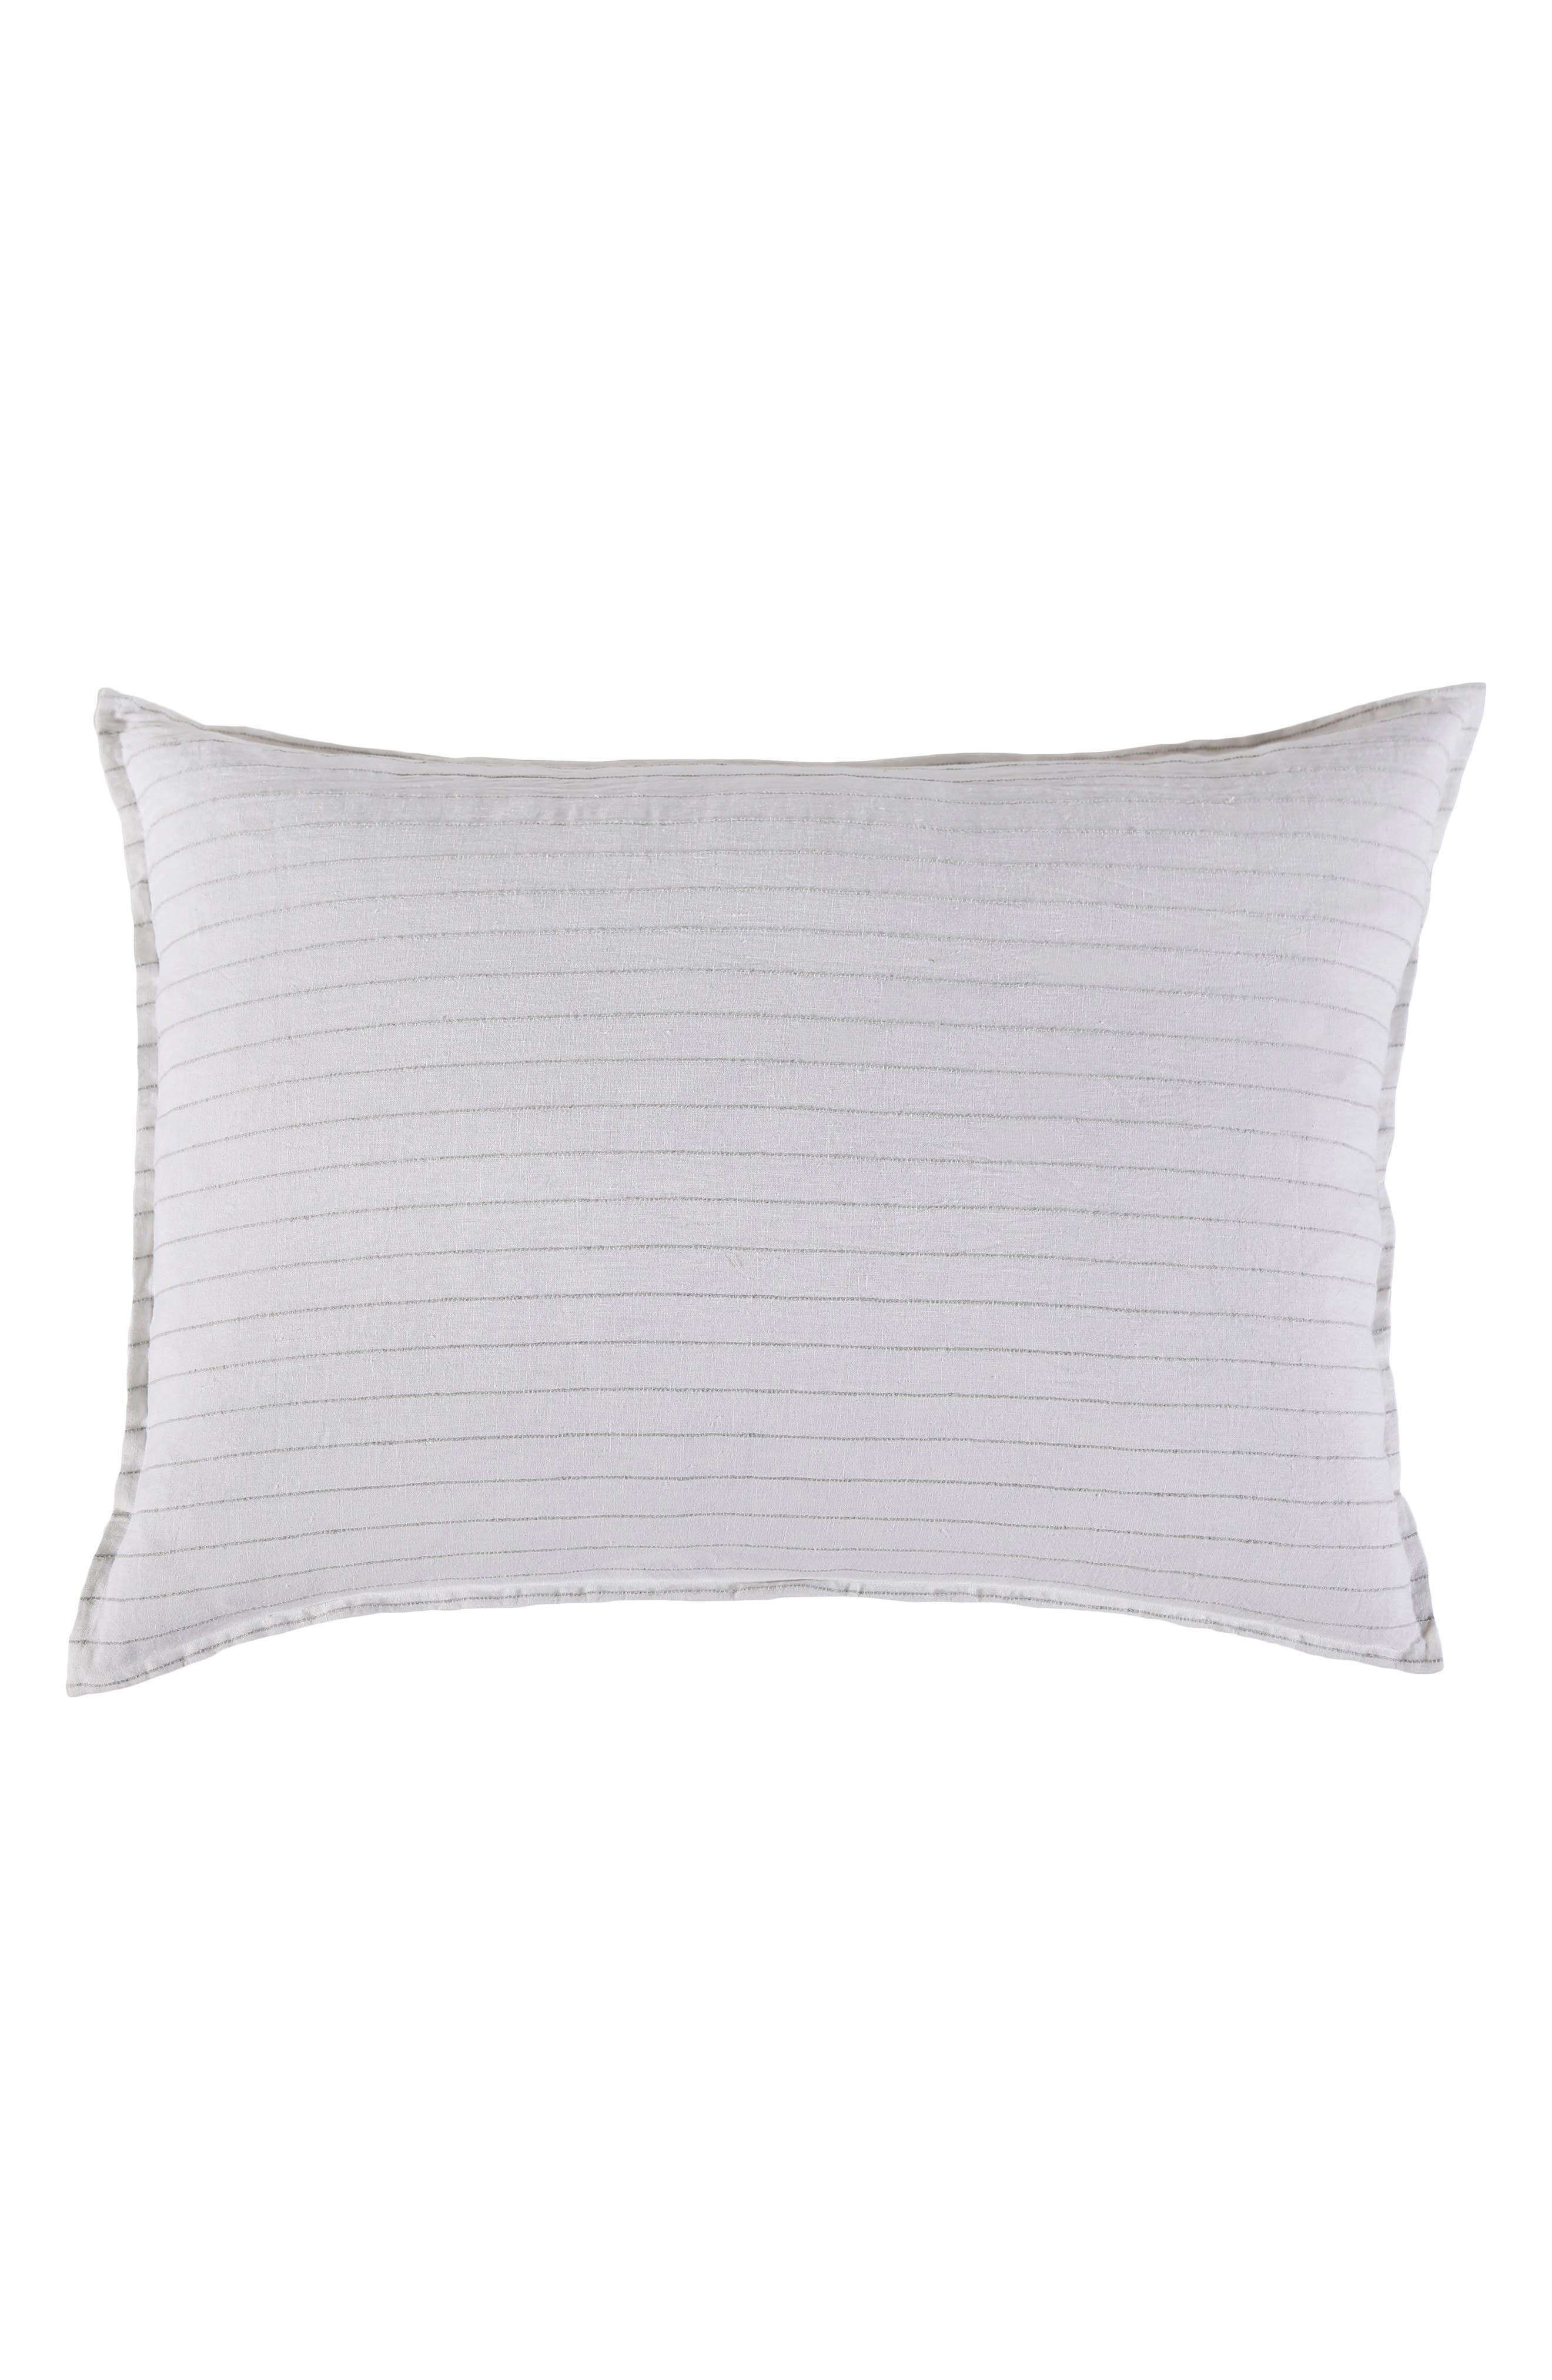 Blake Big Linen Accent Pillow,                             Main thumbnail 1, color,                             WHITE/ OCEAN